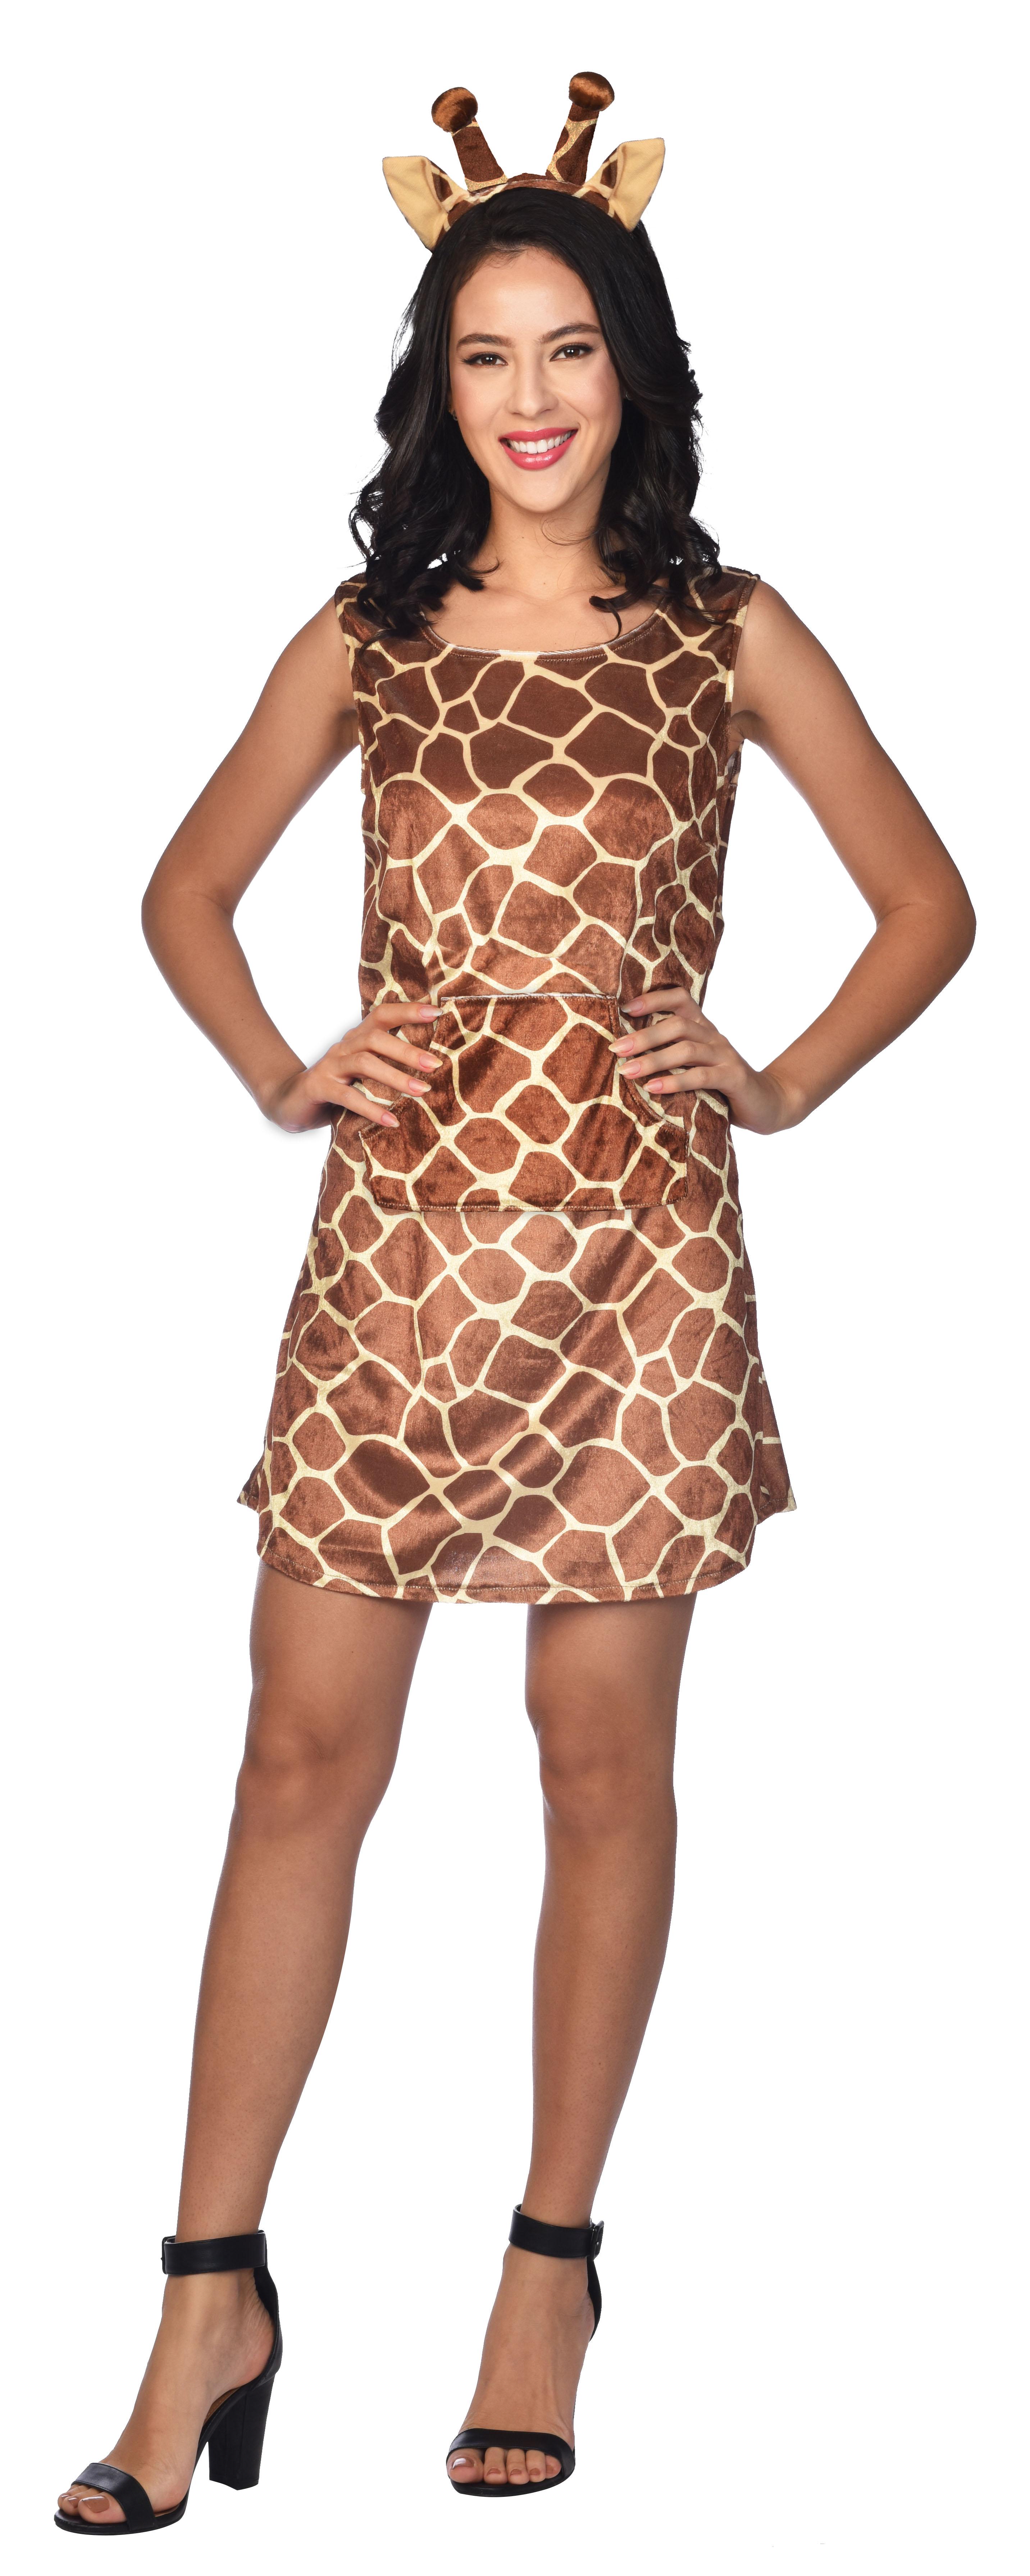 Indexbild 17 - Adult Ladies Zoo Safari Animal Giraffe Lady Fancy Dress Costume Womens Outfit